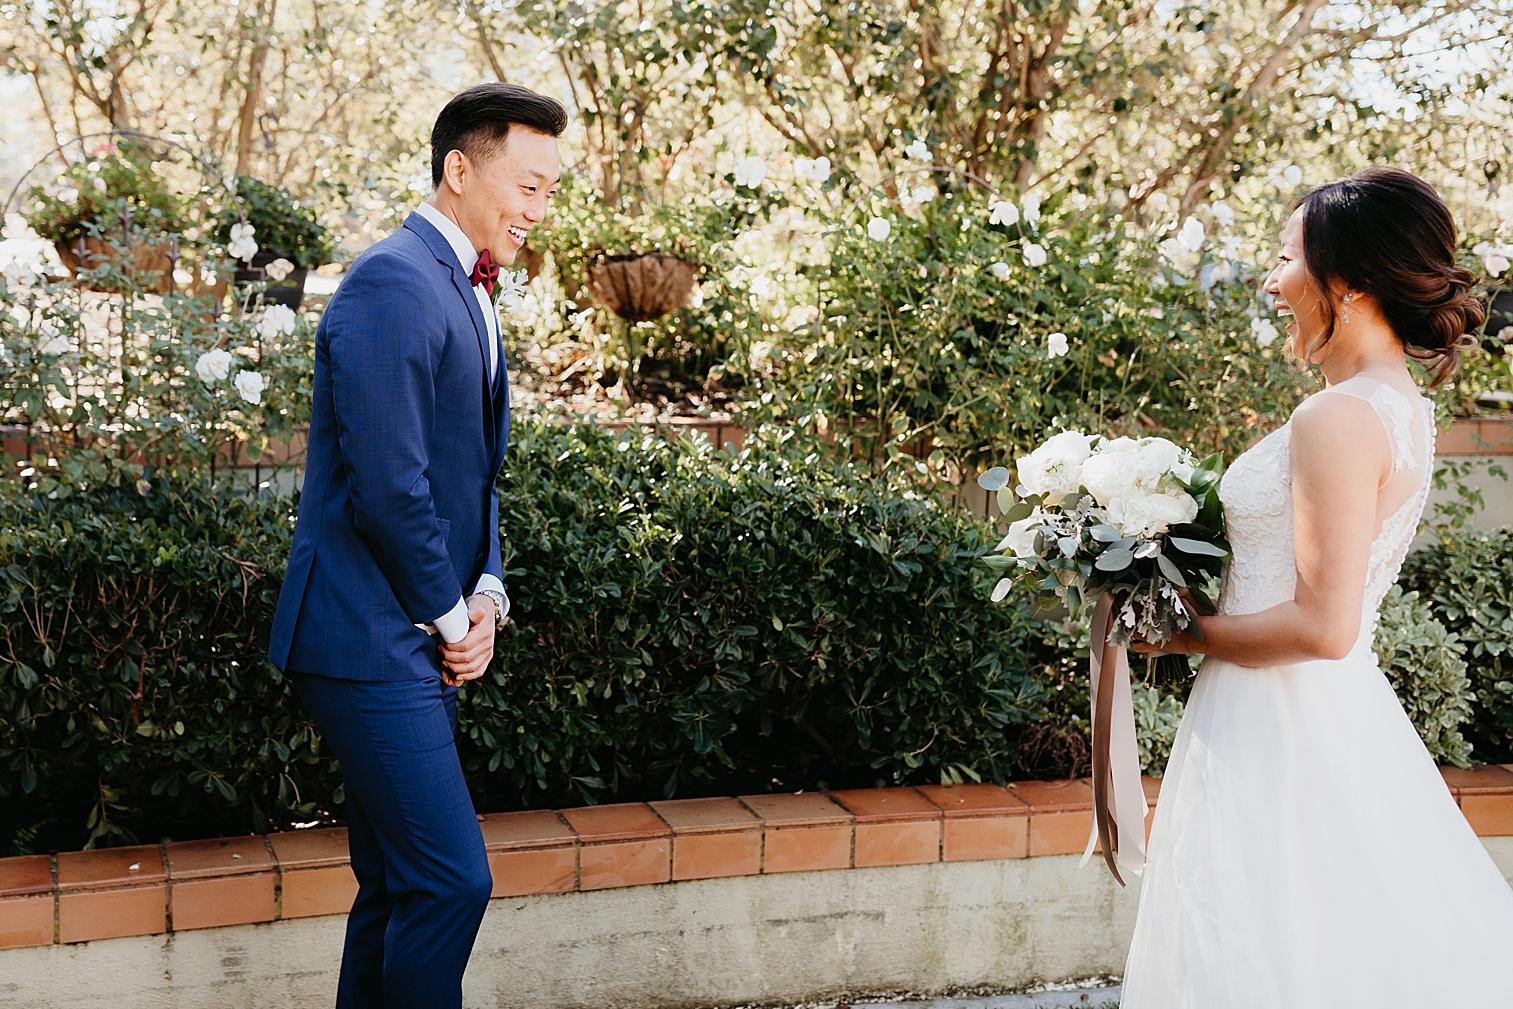 Secret-Garden-Rancho-Santa-Fe-Wedding-27.jpg